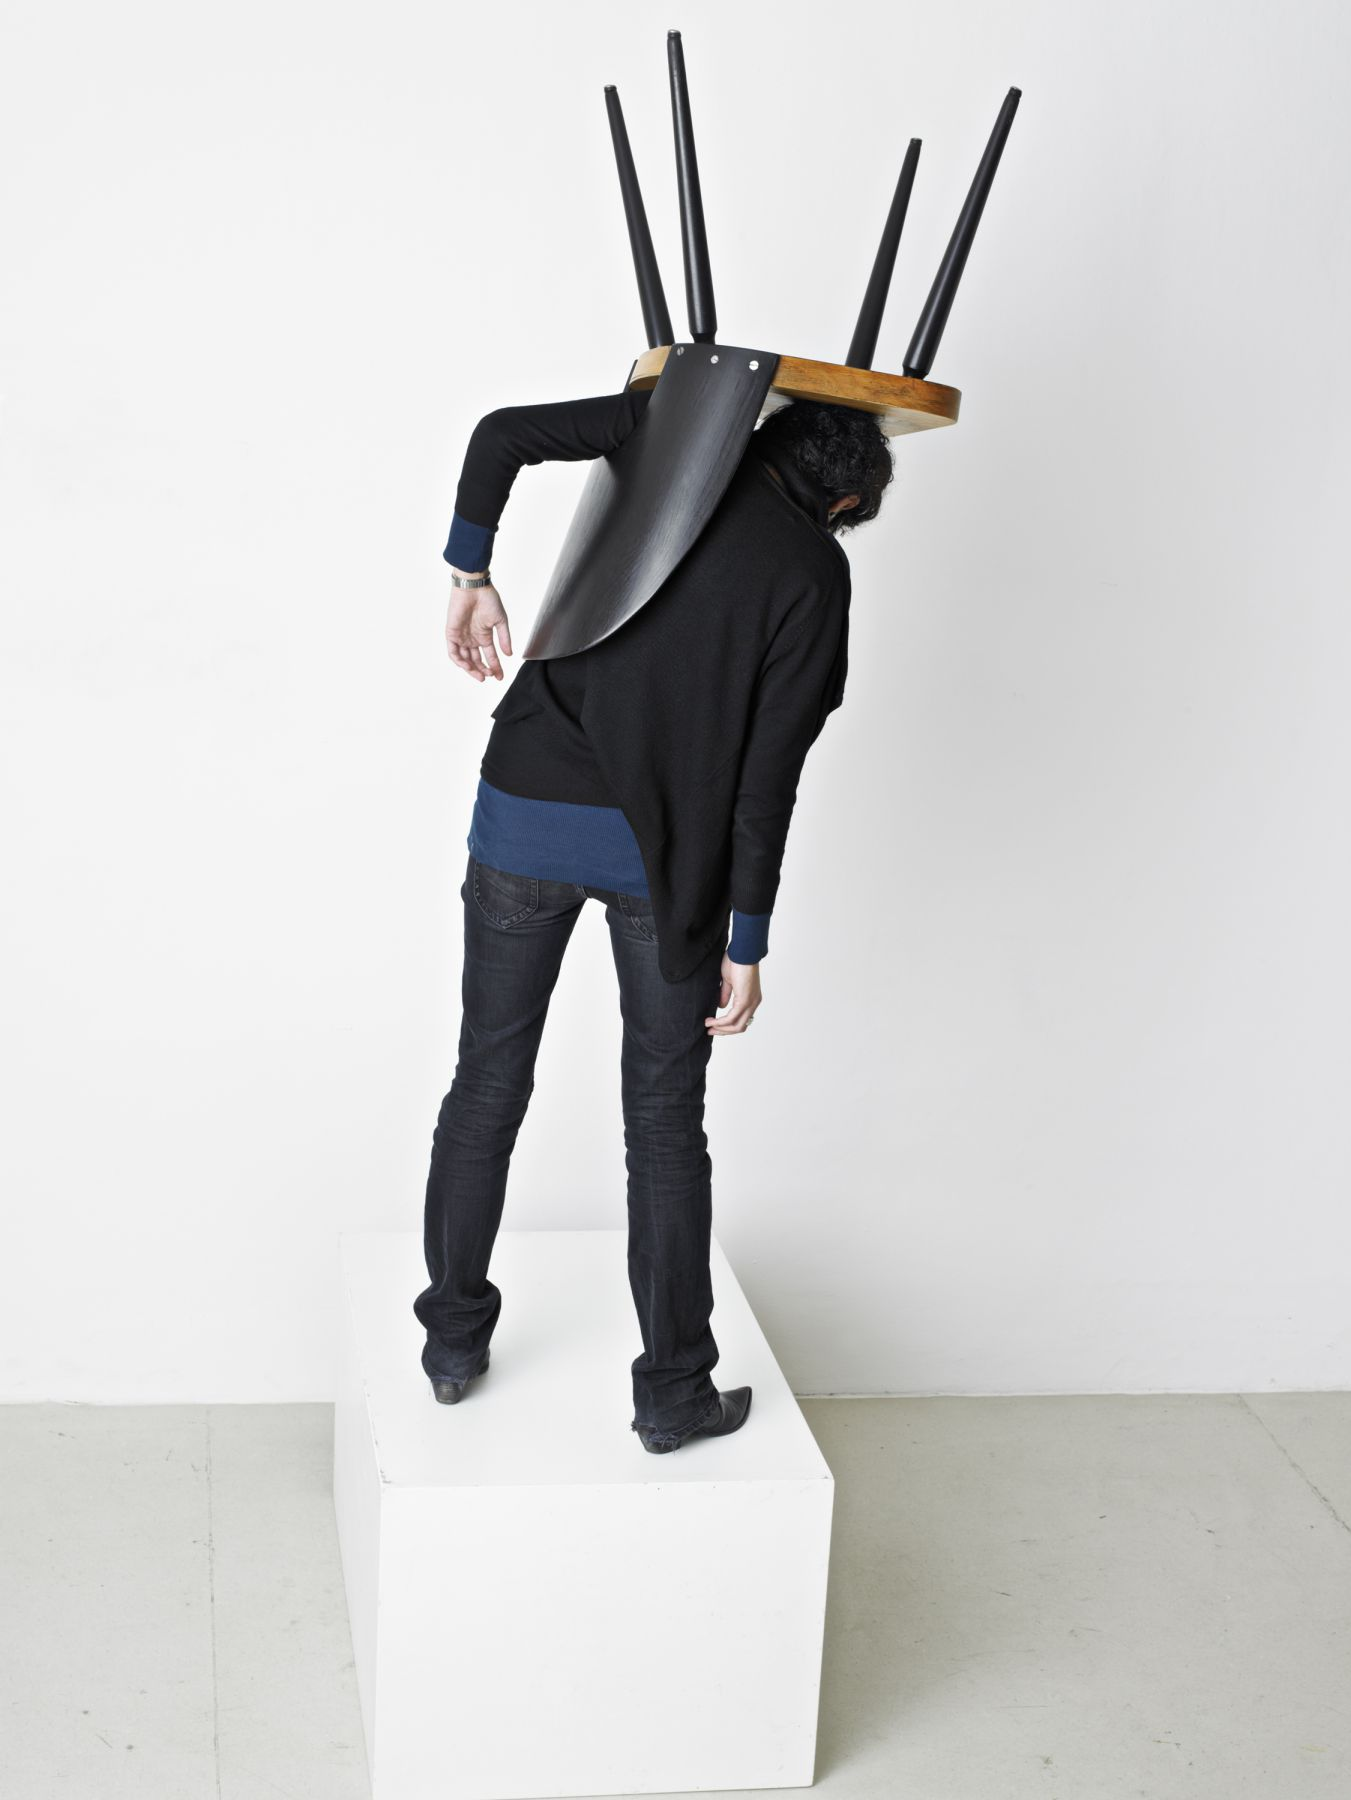 ERWIN WURM, Idiot I, 2010